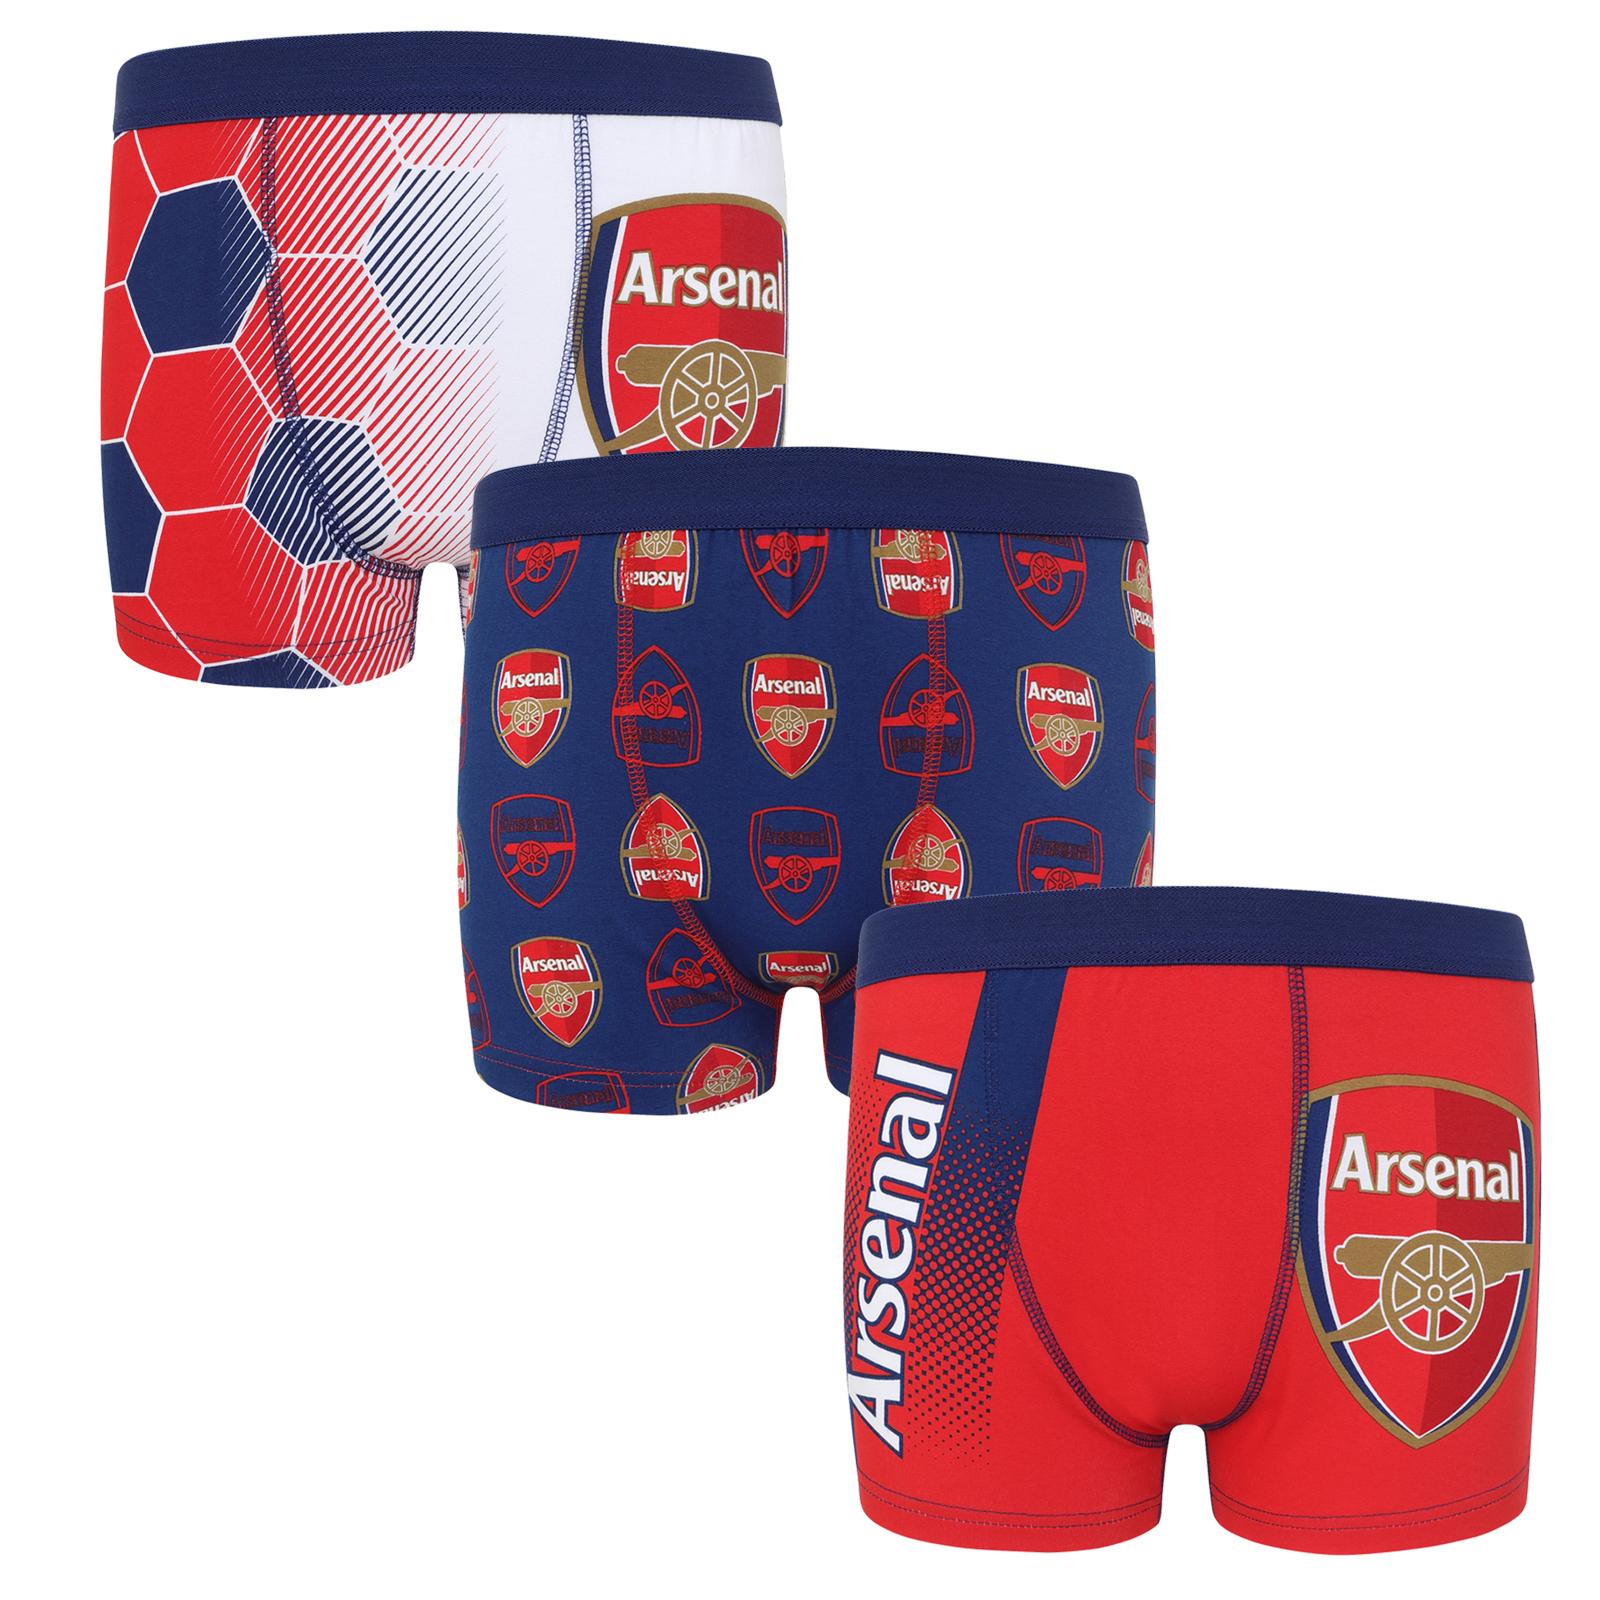 Tottenham Hotspur FC Official Football Gift 3 Pack Boys Crest Boxer Shorts